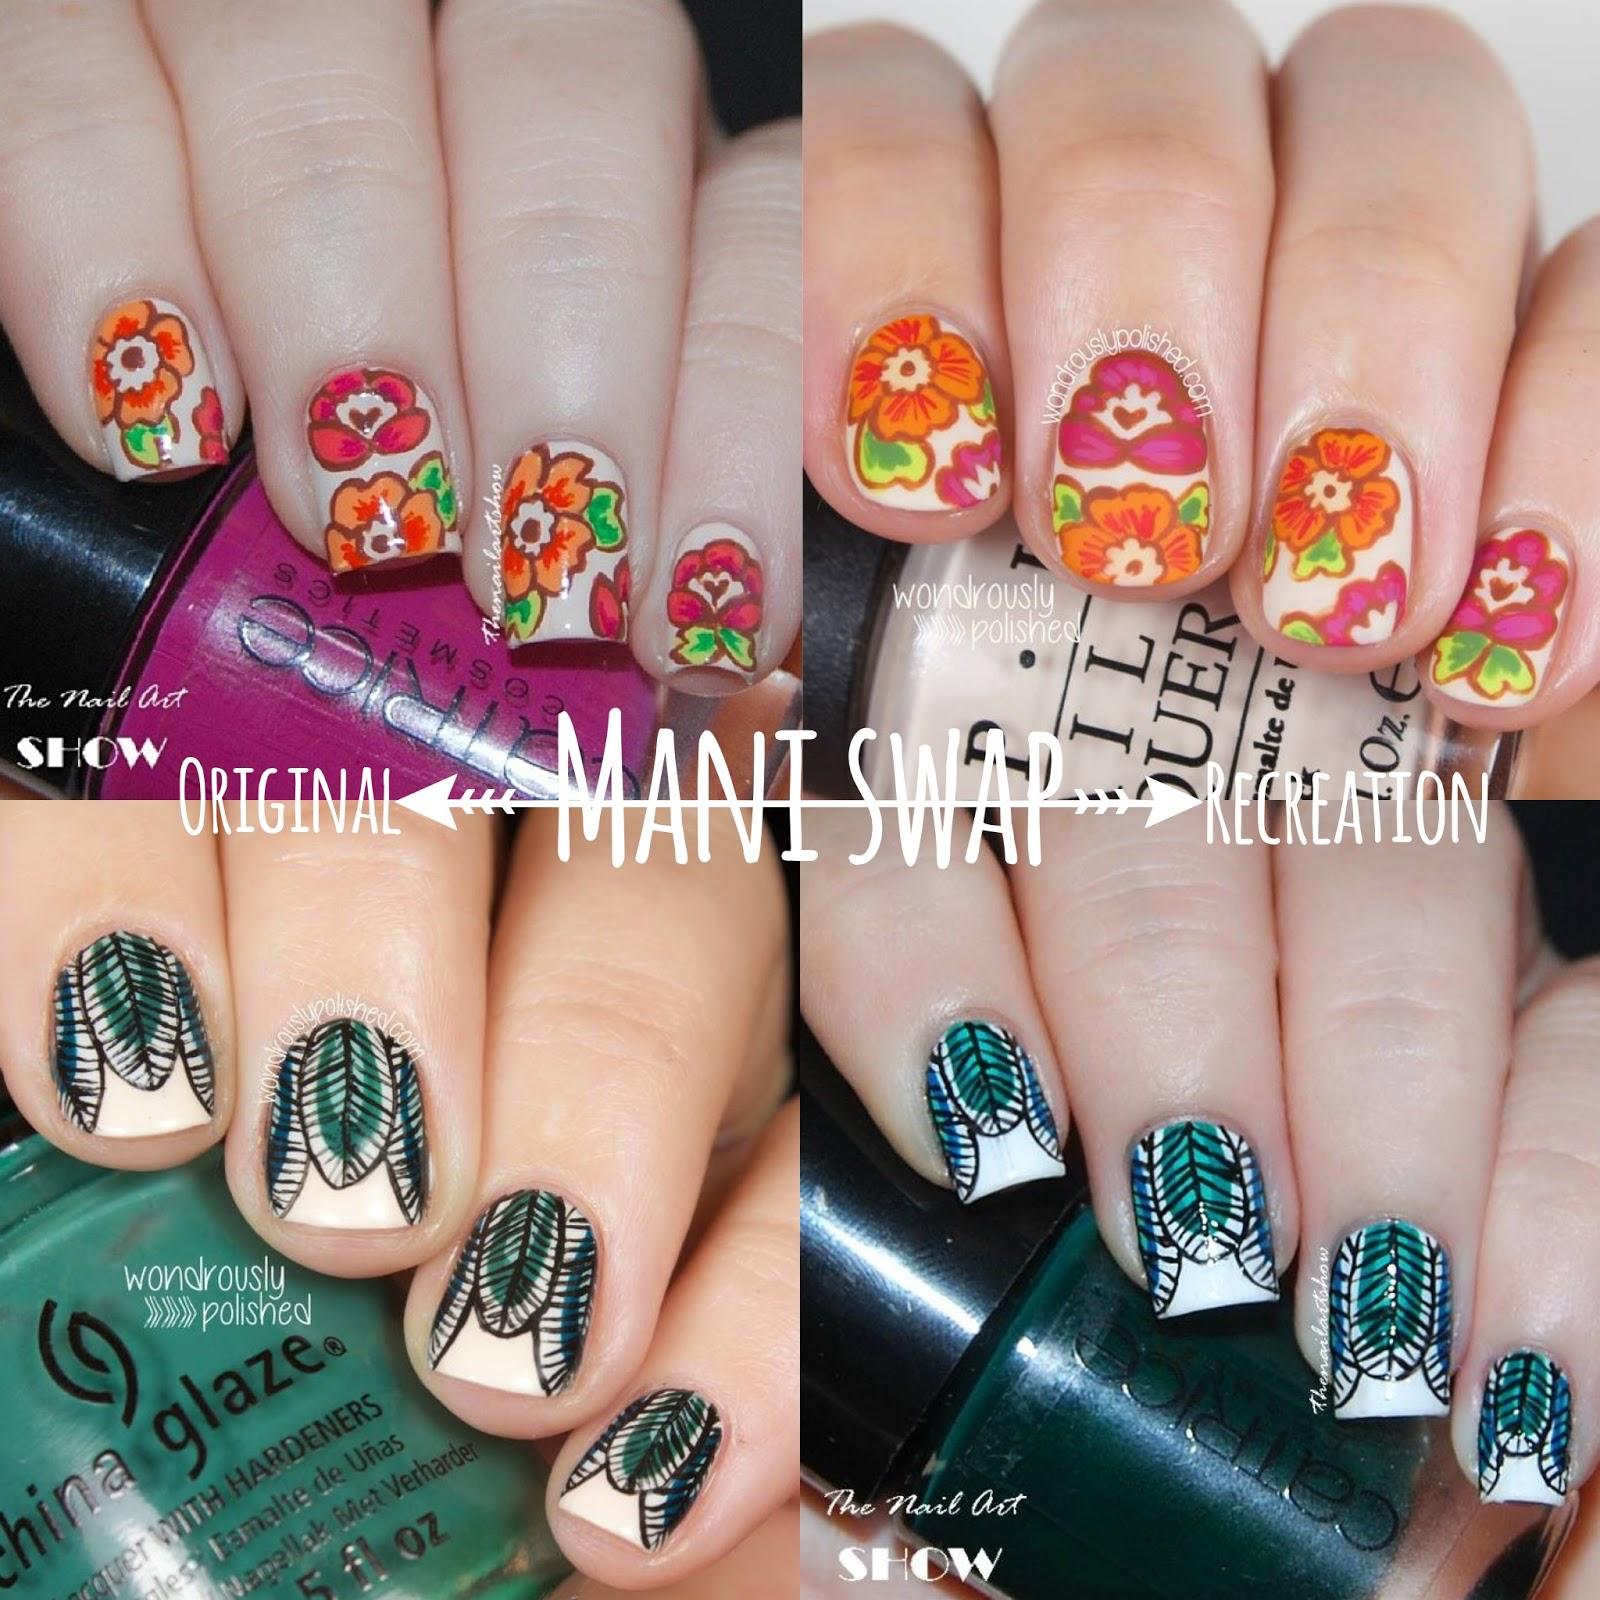 Wondrously Polished Mani Swap With Mireia Of The Nail Art Show